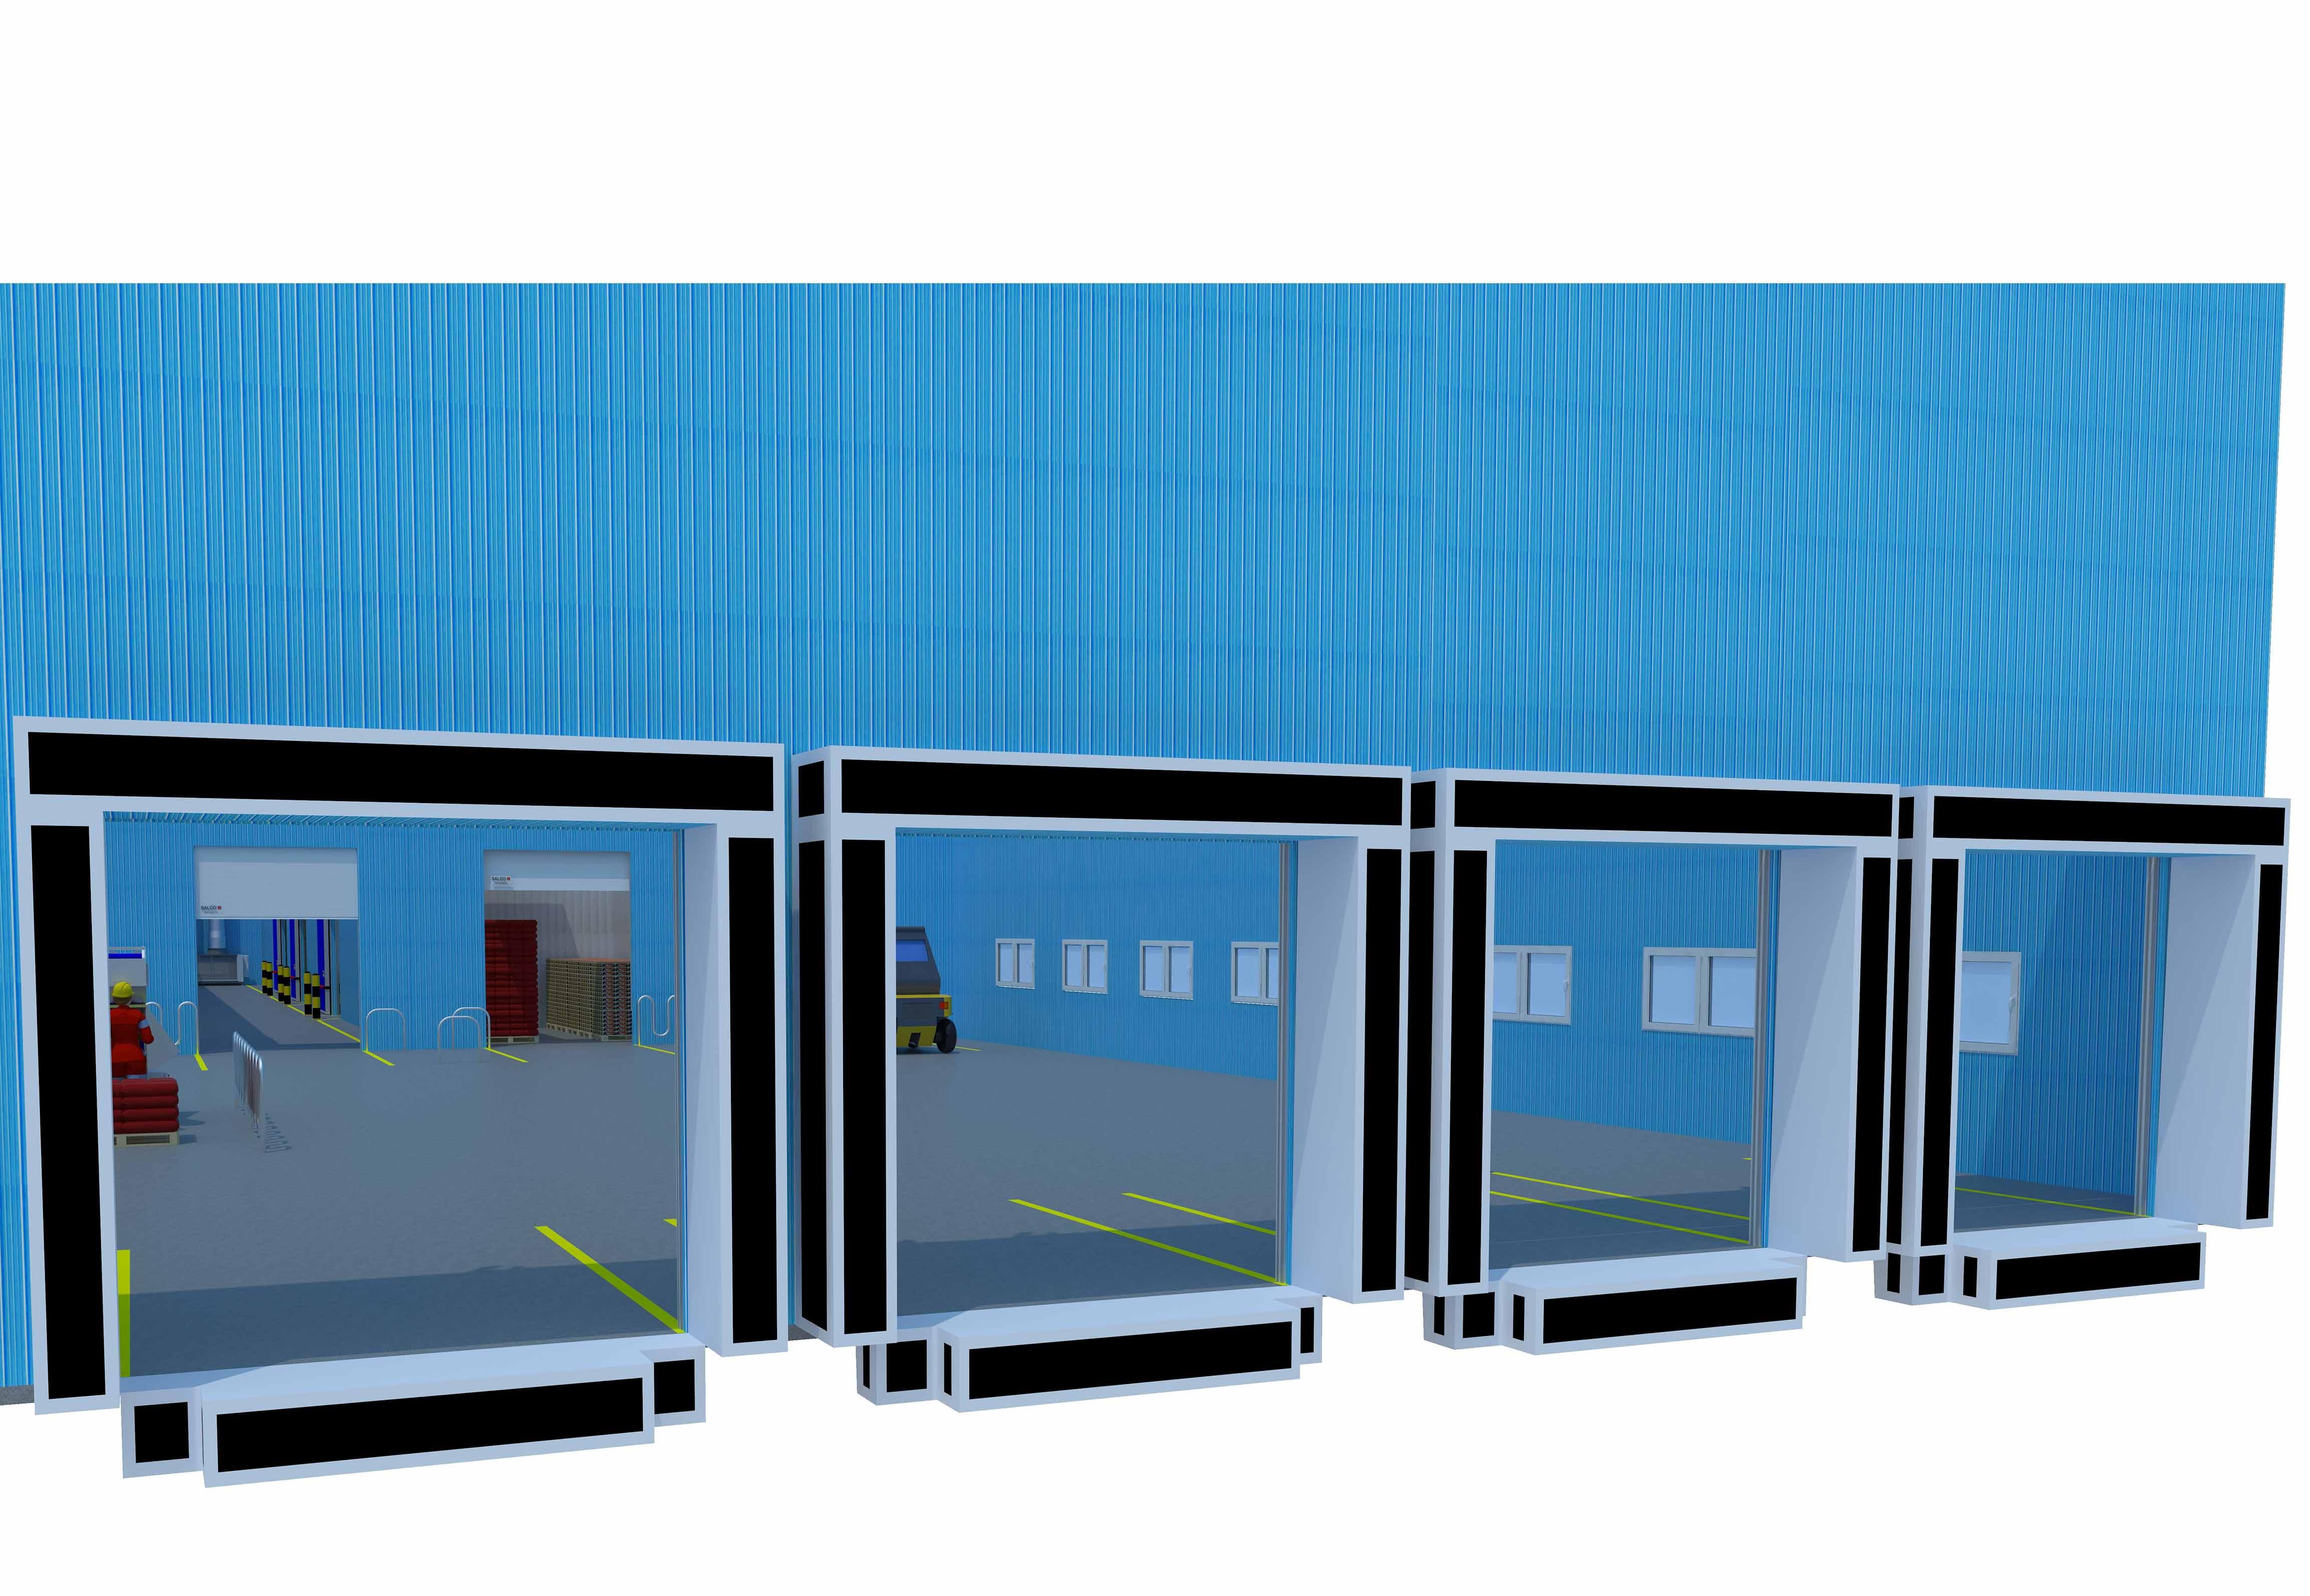 loading dock for vegetable distribution centre